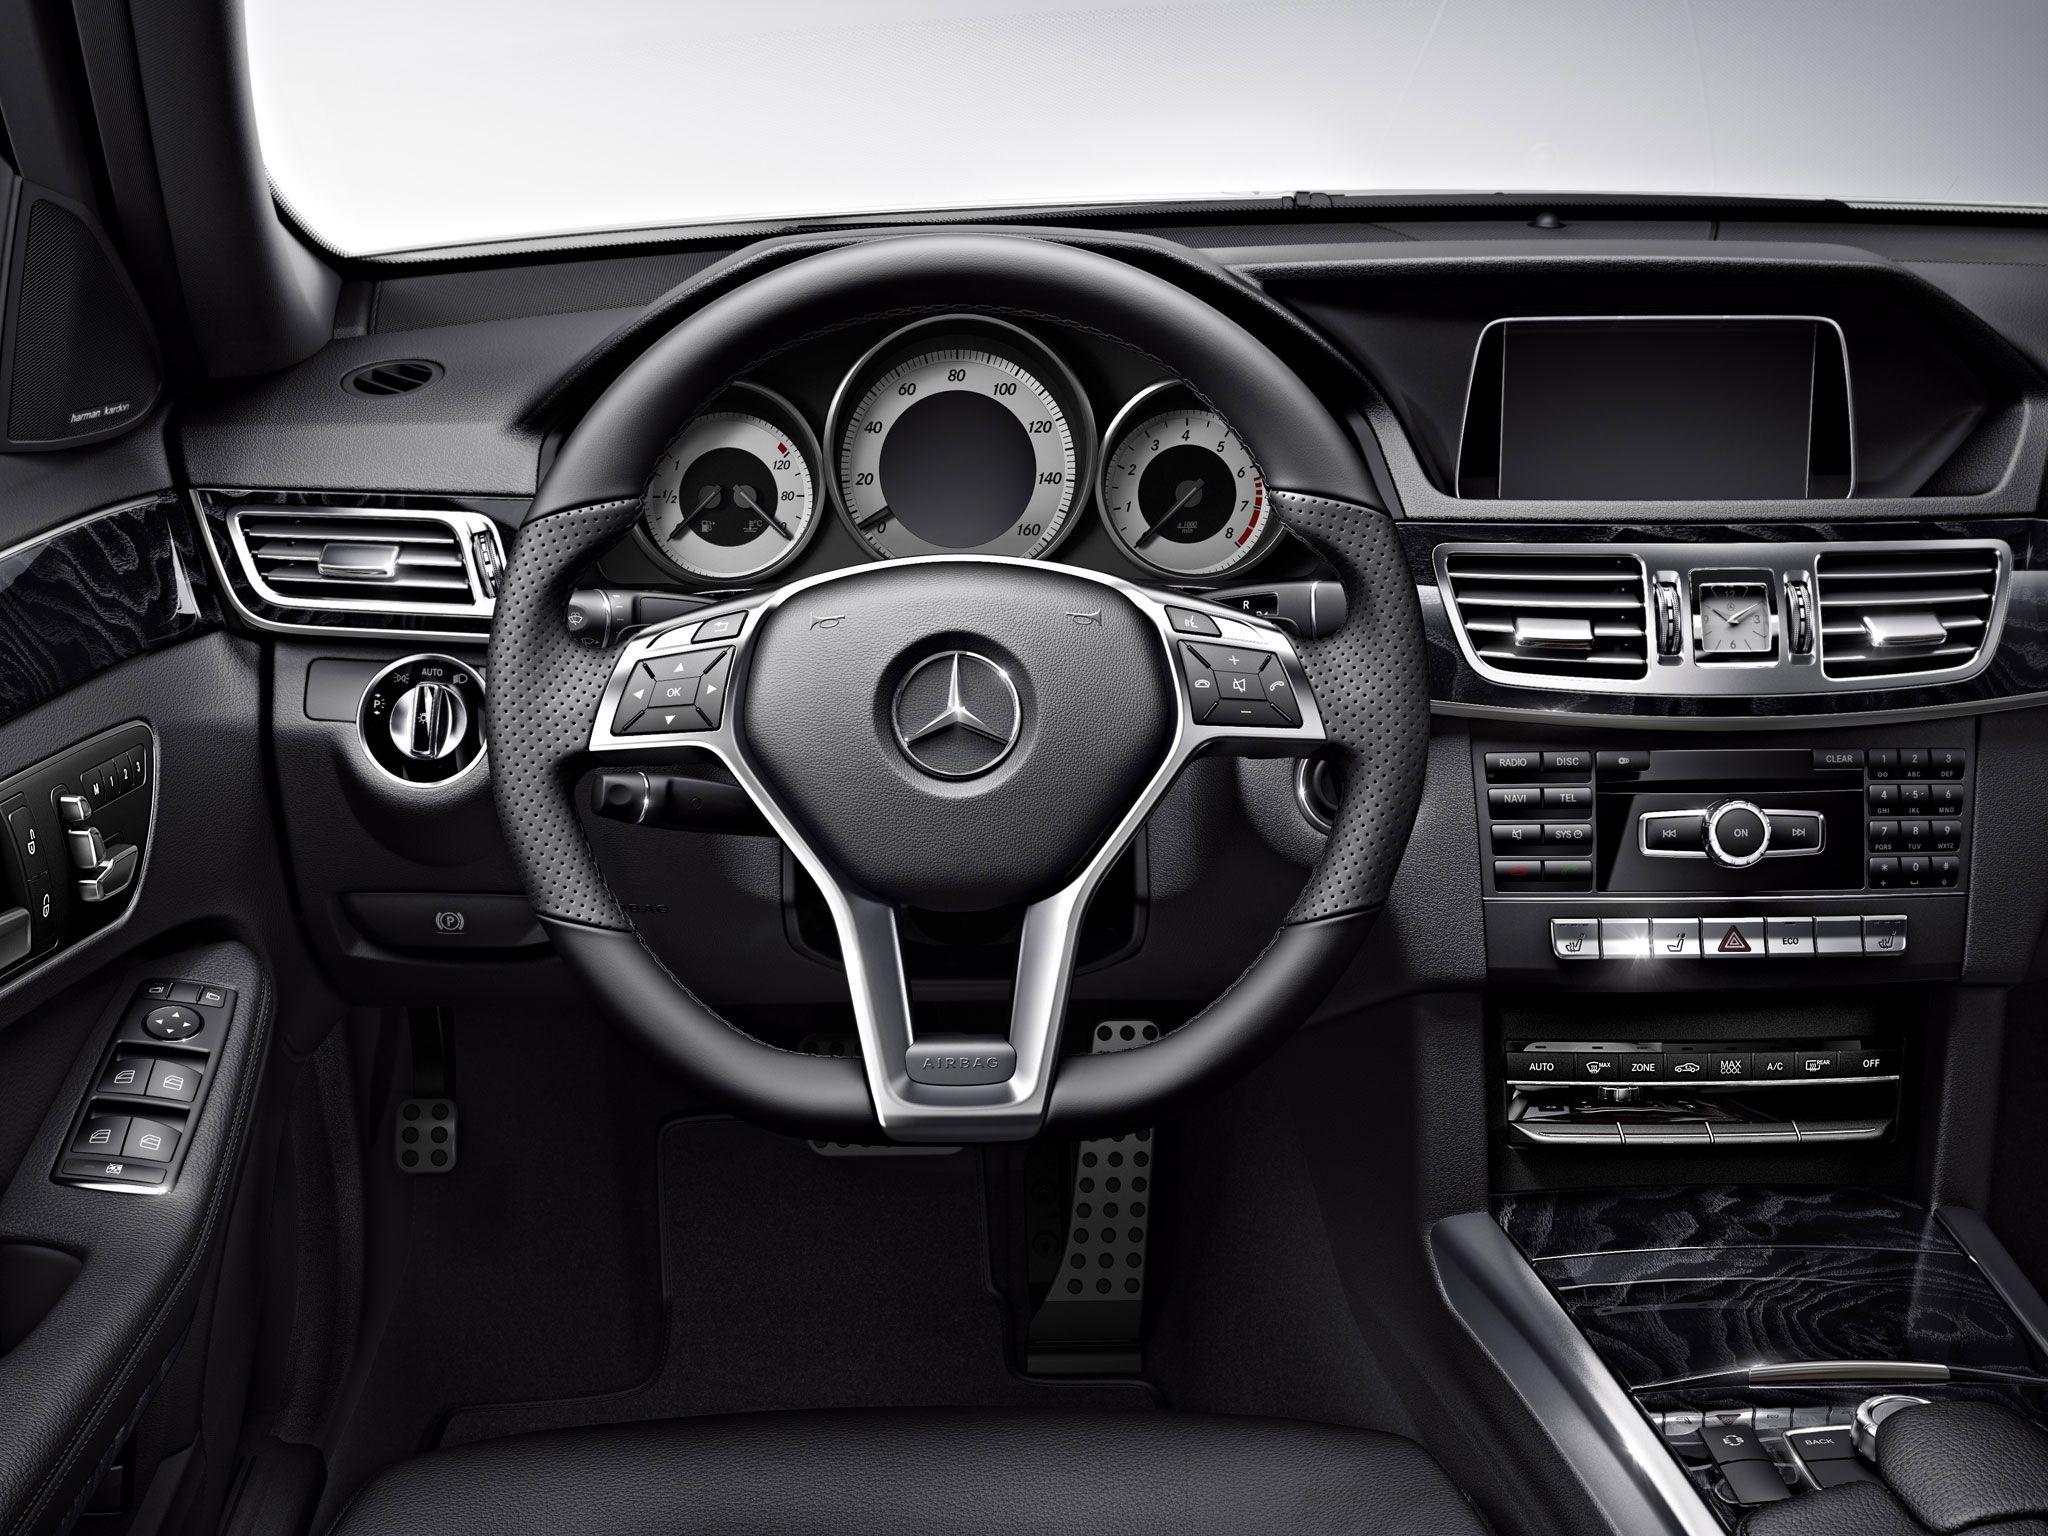 2014 mercedes e class wagon wheel package interior mercedes e class hd images pinterest - 2014 mercedes c class interior ...